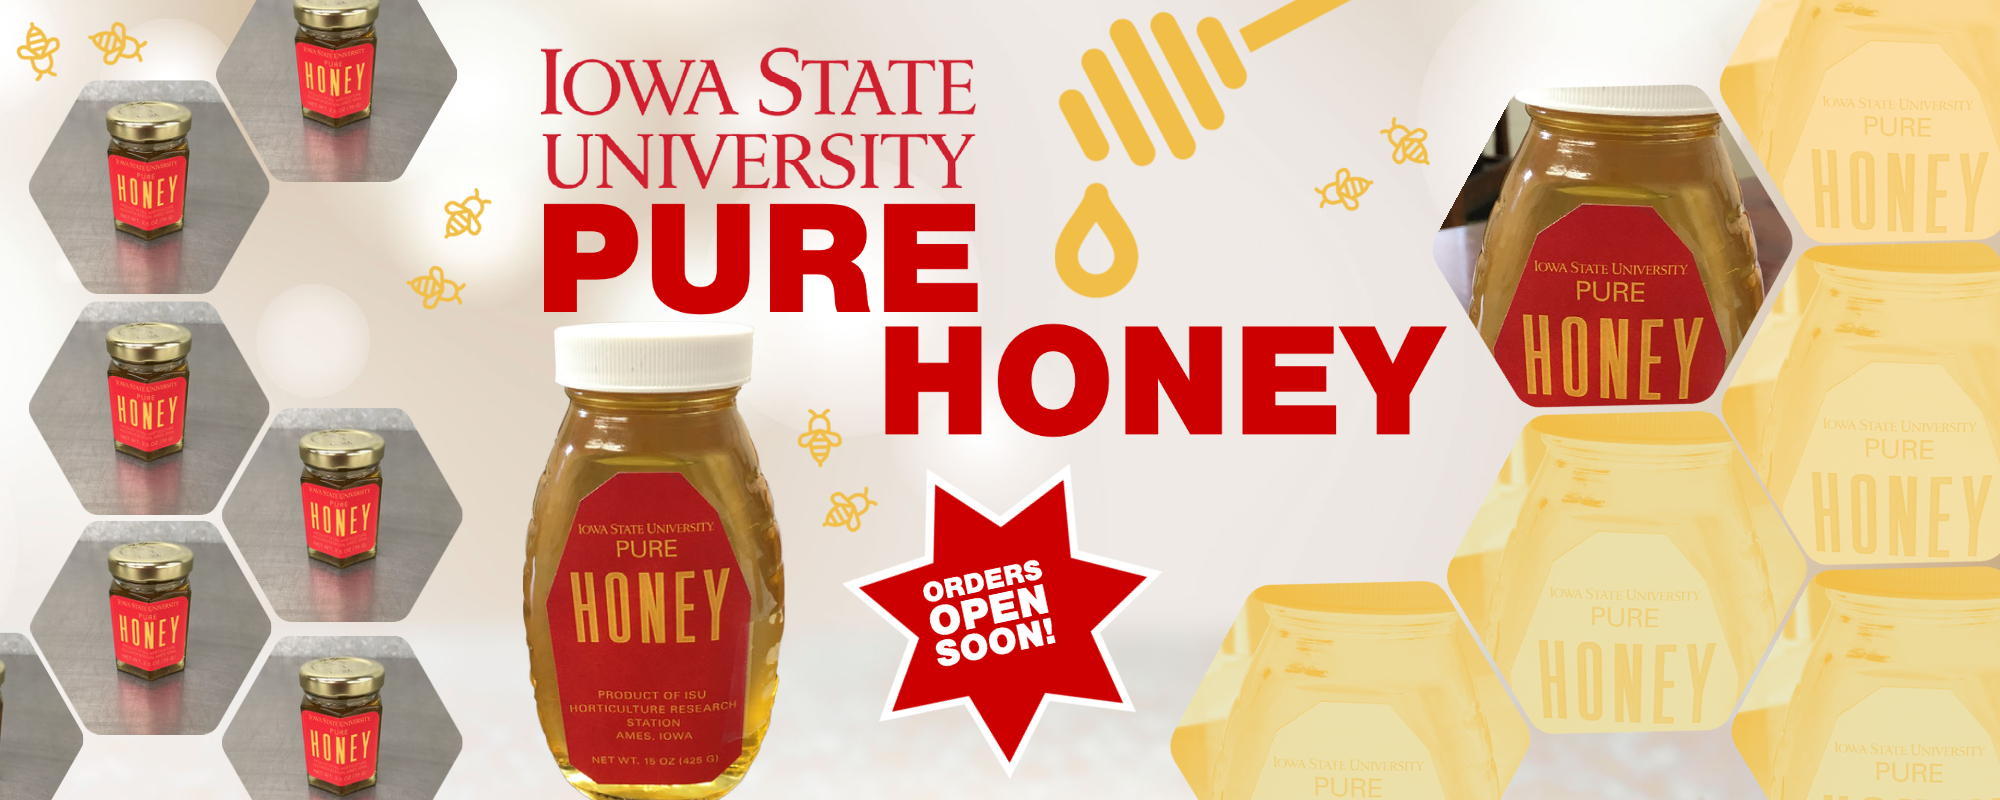 Iowa State University Pure Honey. Orders open soon.